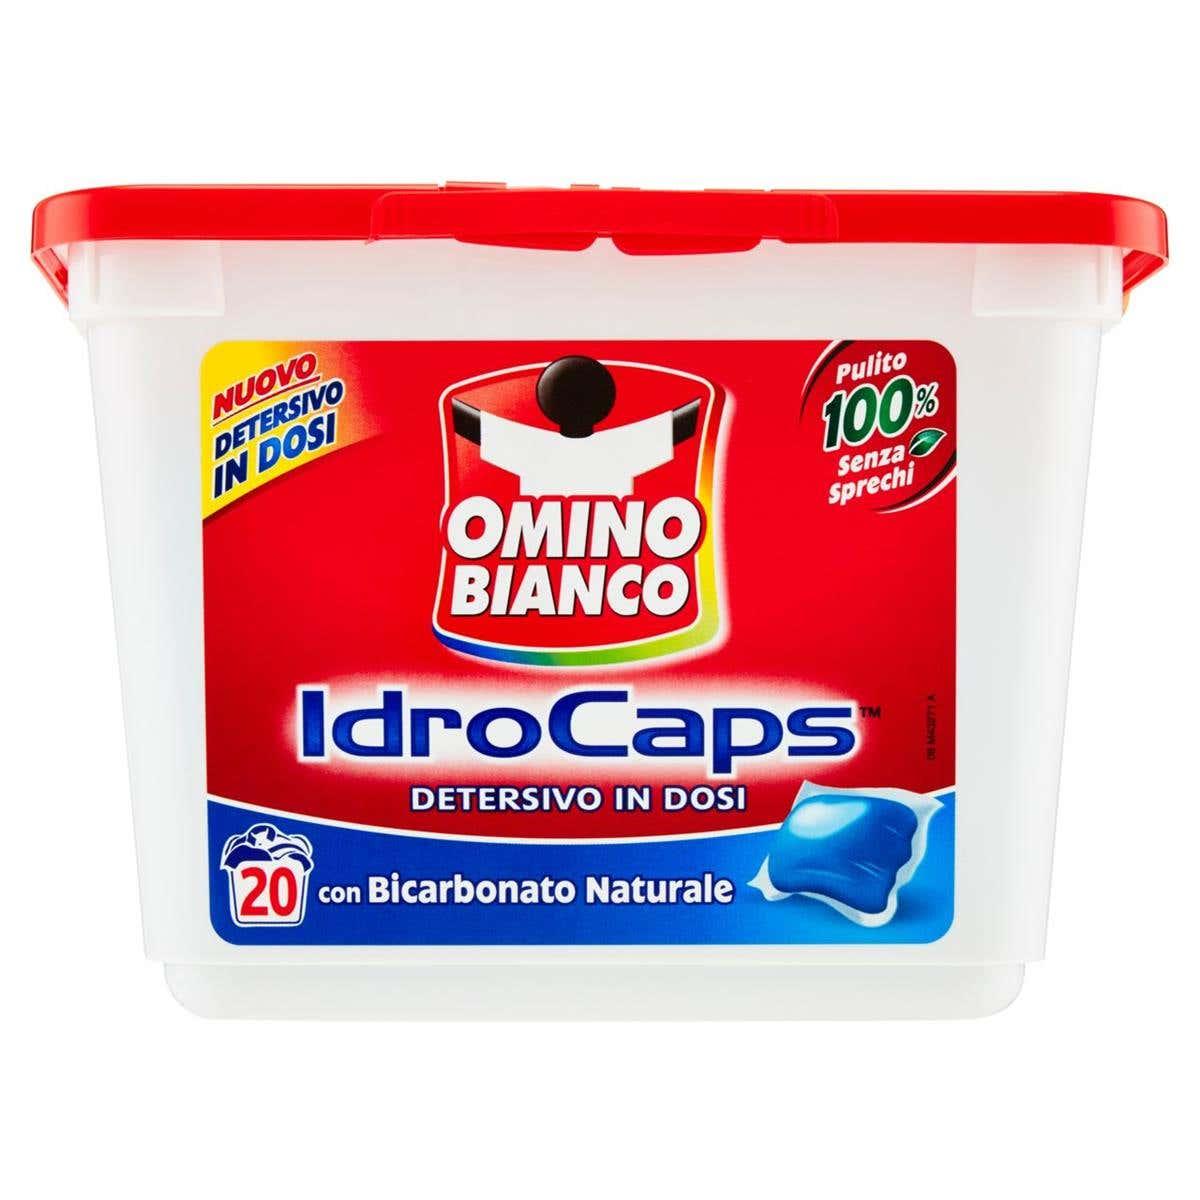 Omino Bianco gelové kapsle na praní s prací sodou, 20 ks